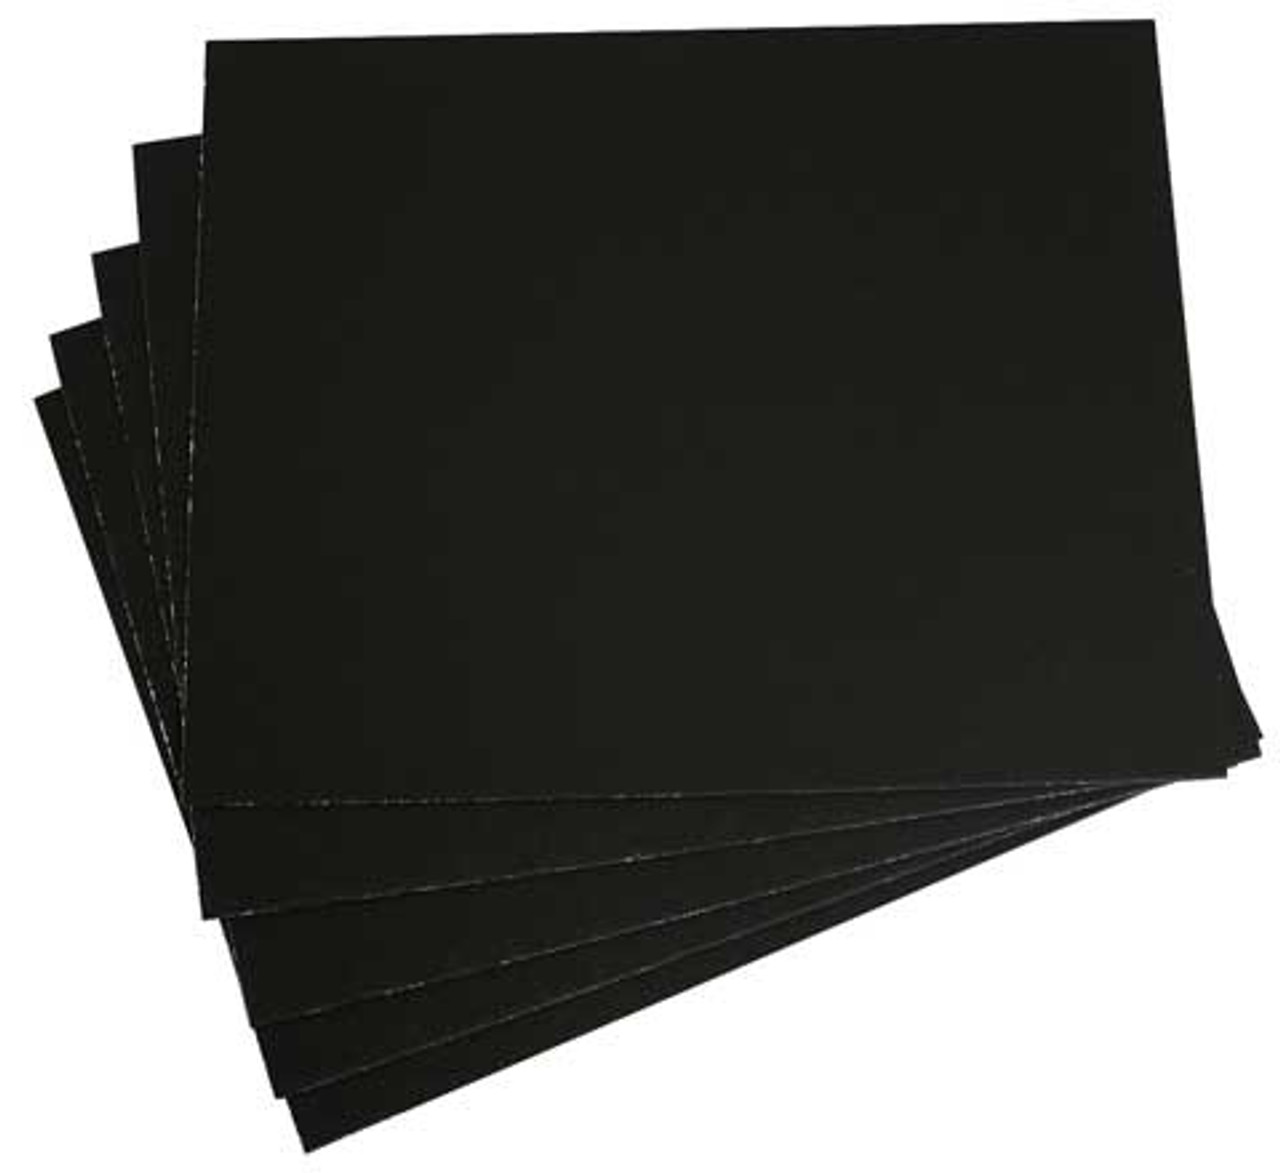 15x20 50pk Super Black Presentation & Mounting Boards